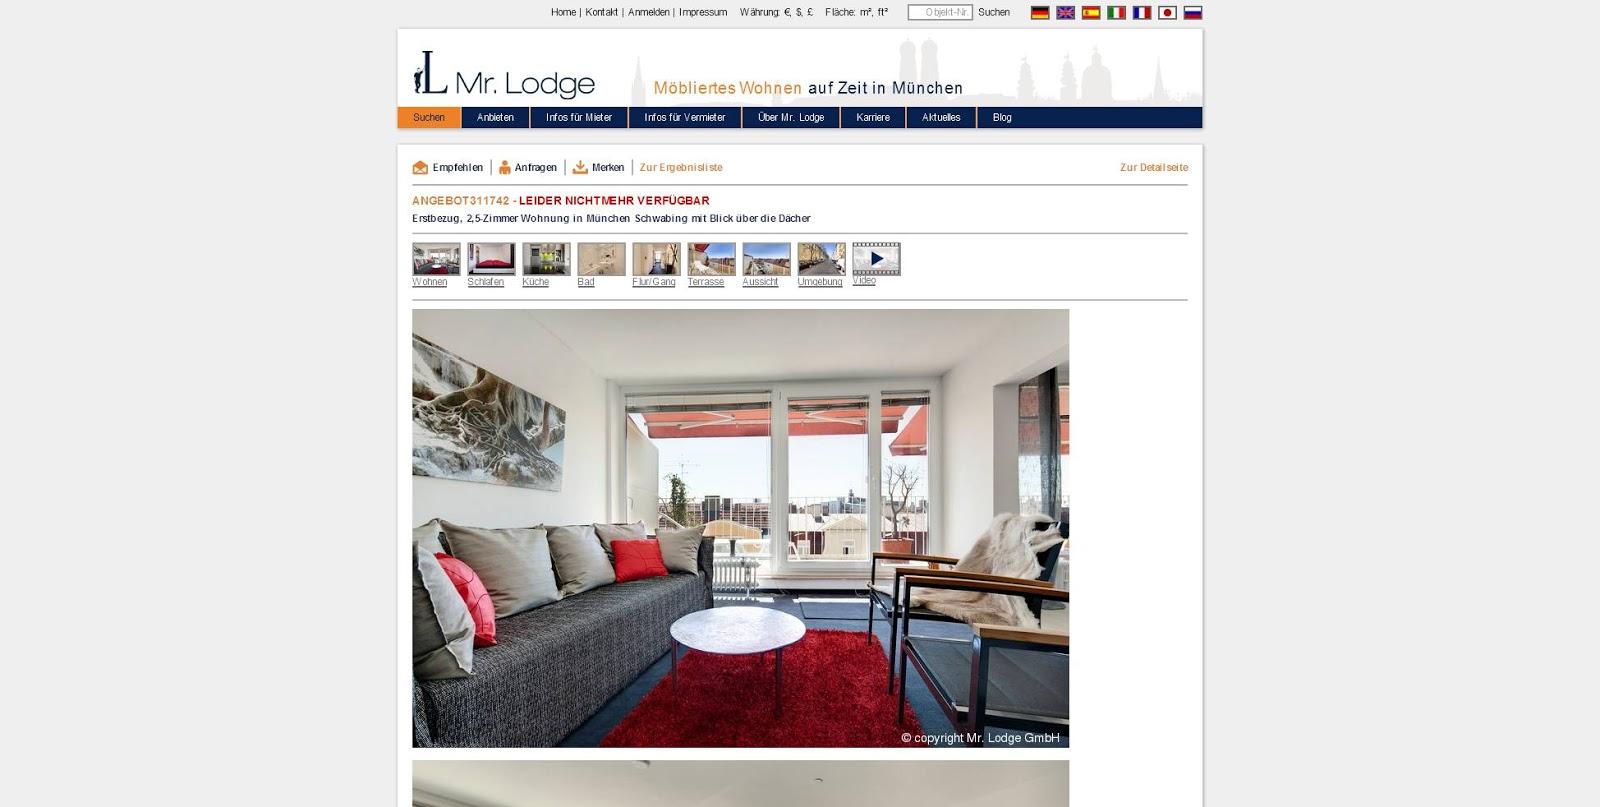 uncategorized informationen ber wohnungsbetrug seite 157. Black Bedroom Furniture Sets. Home Design Ideas